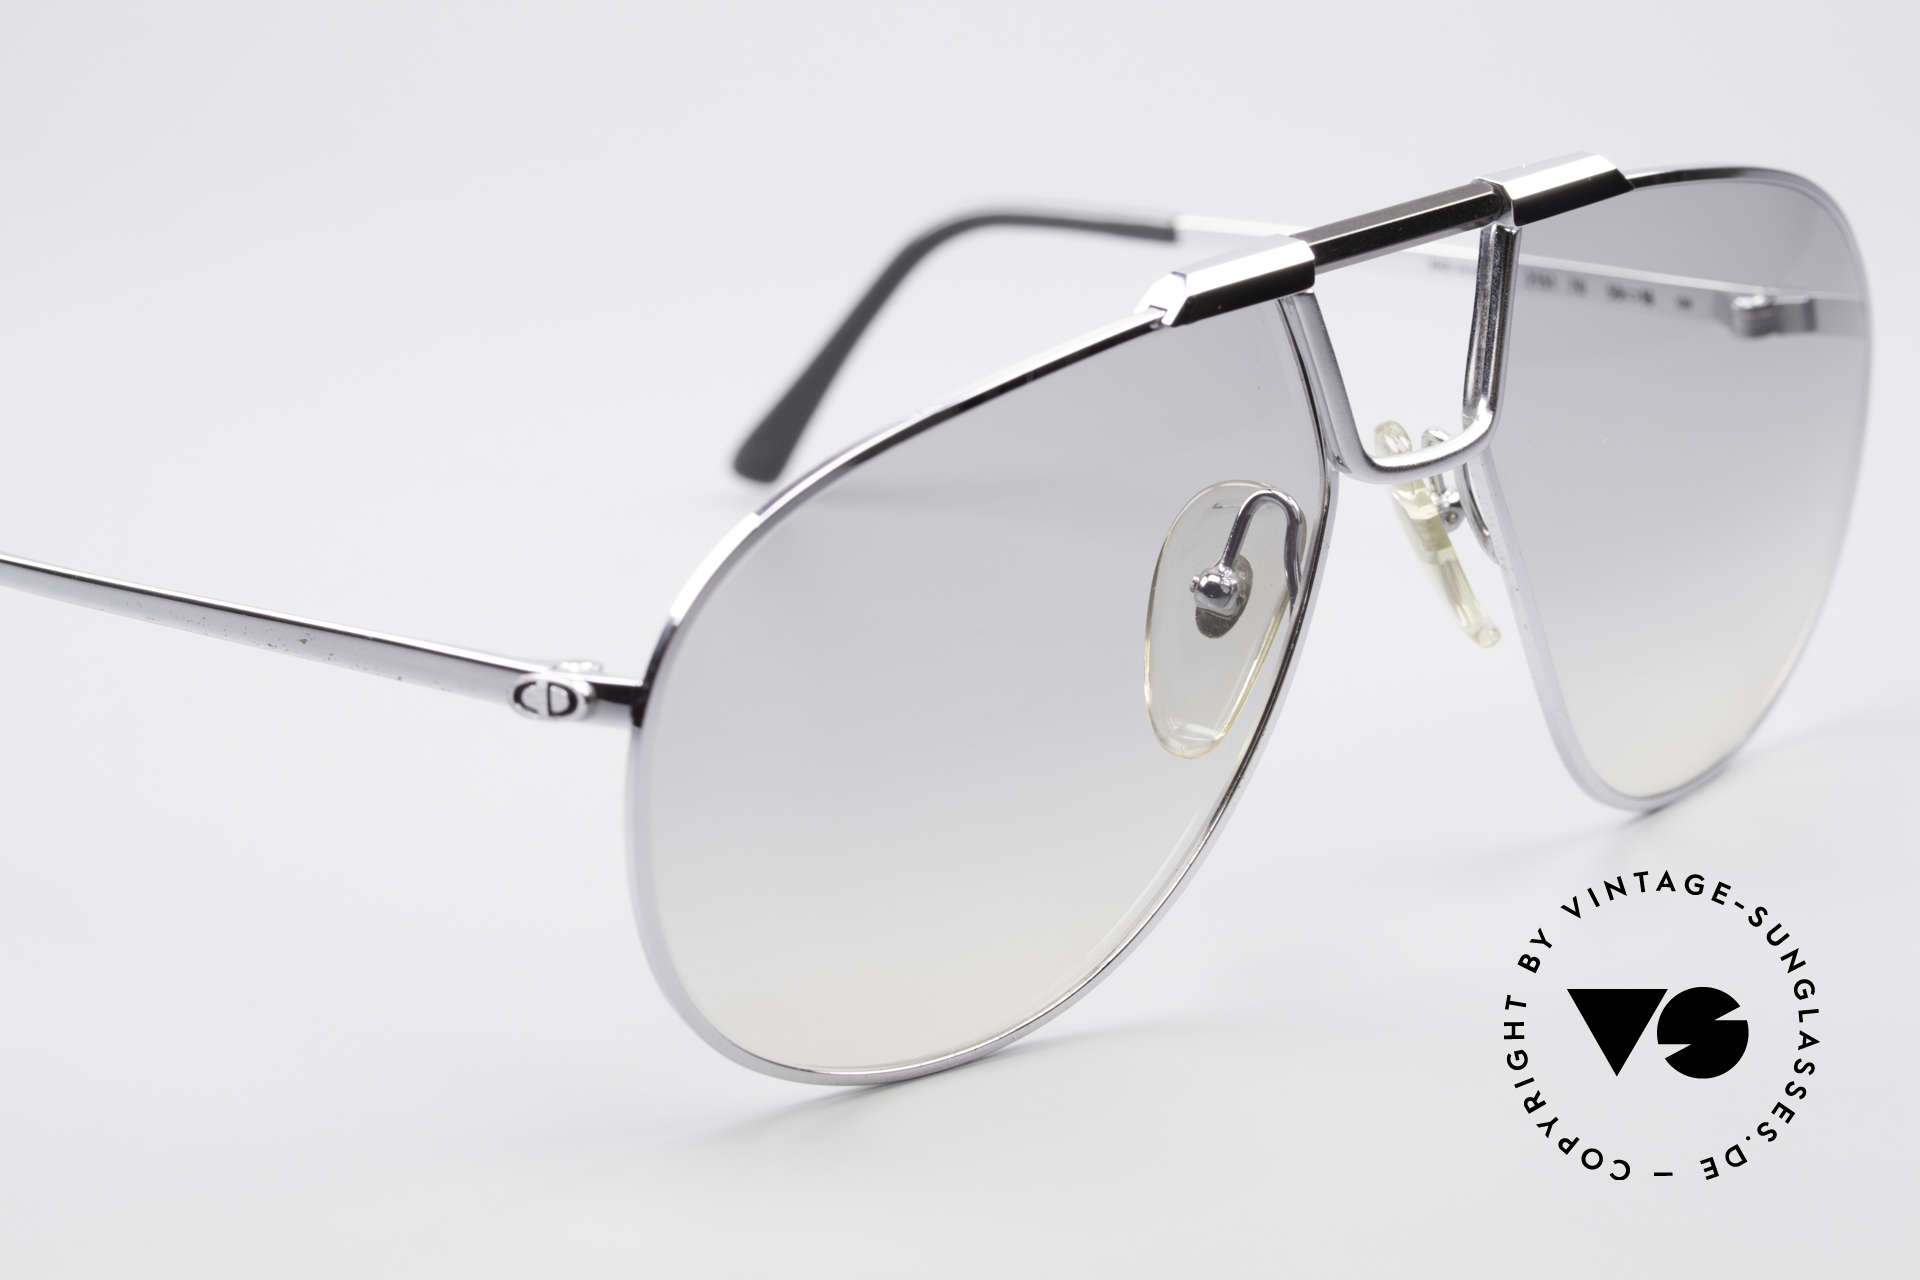 Christian Dior 2151 Monsieur Sunglasses Medium, unworn rarity - NEW OLD STOCK - true vintage!, Made for Men